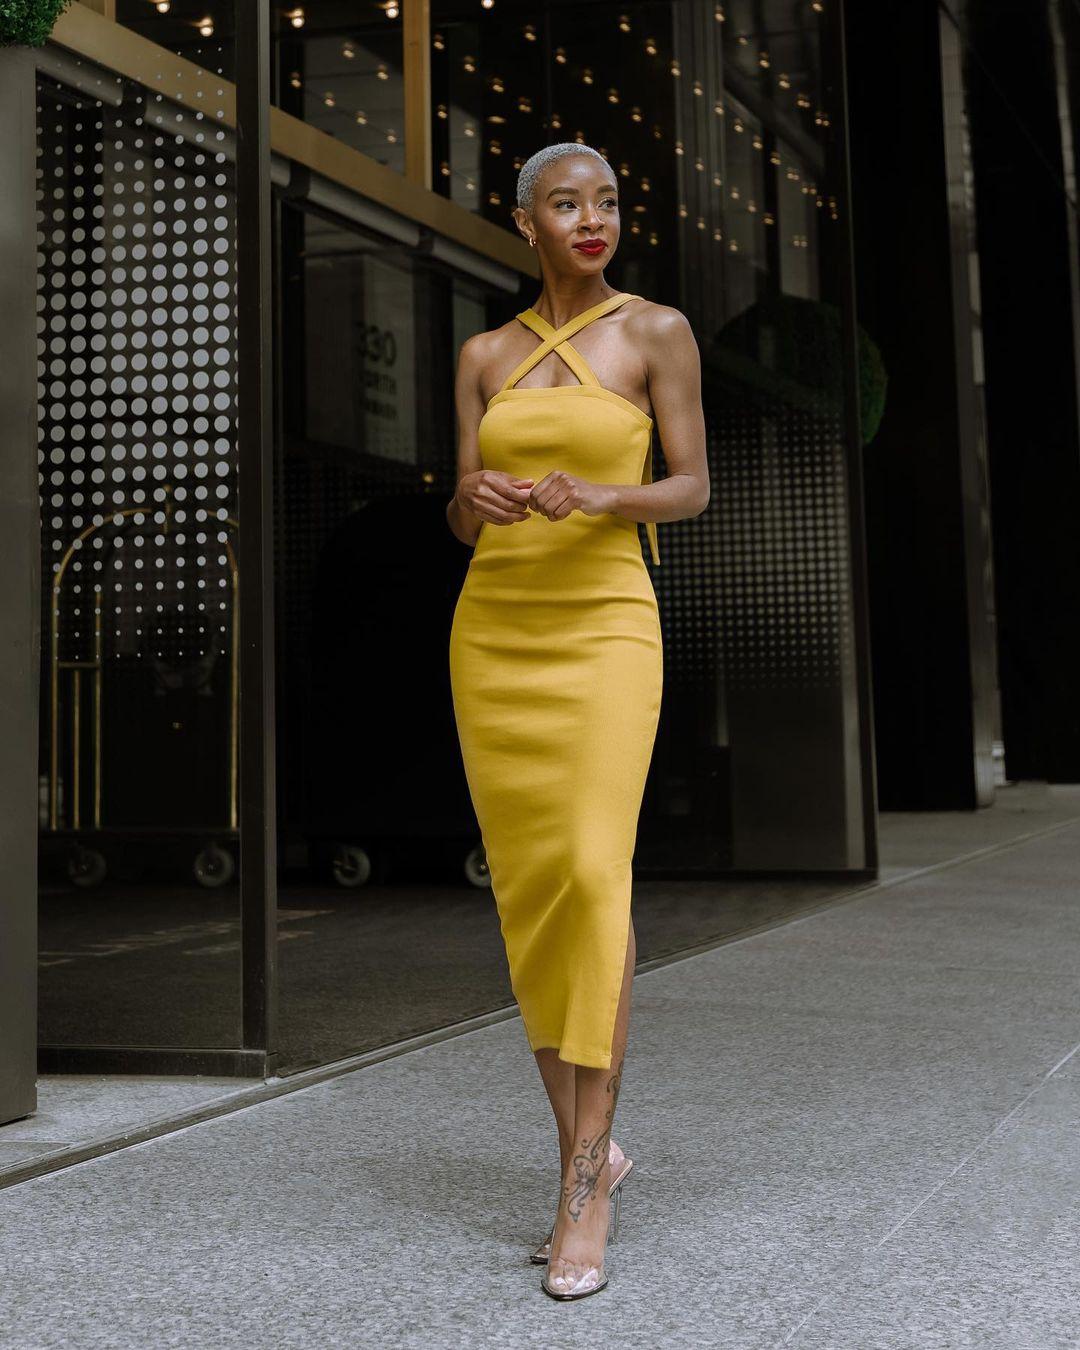 CelebsThatRock E57: 17 Super Hawt Outfits From Last Week